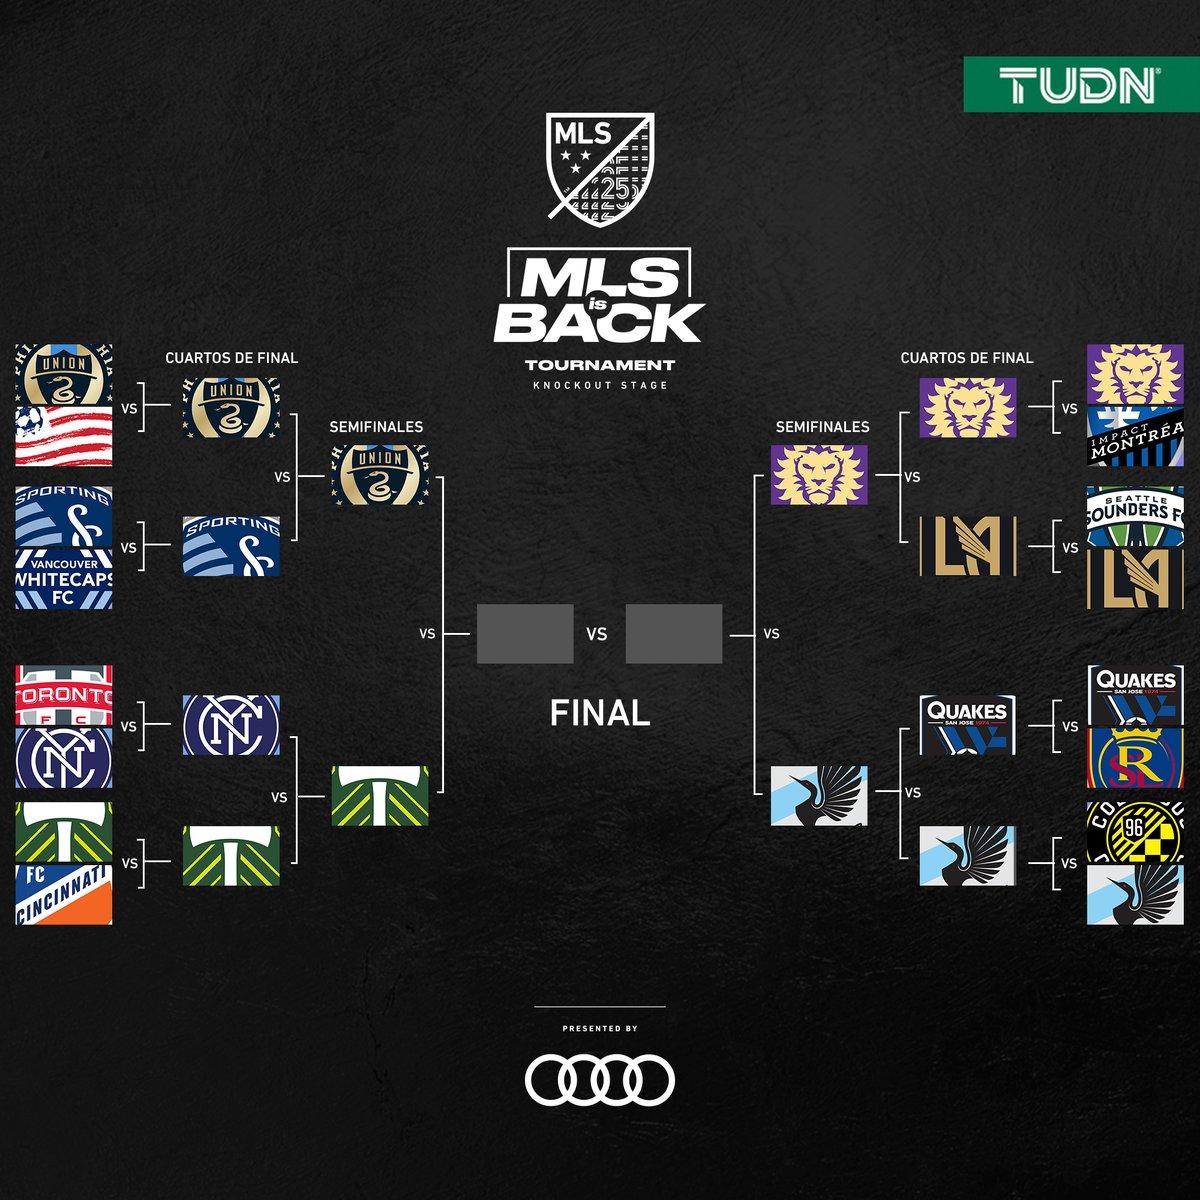 Definidas las semifinales del torneo #MLSisBack   #DOOP vs #RCTID #OrlandoCity vs #MNUFC   Presentado por @Audi pic.twitter.com/kAx4OfU6kX